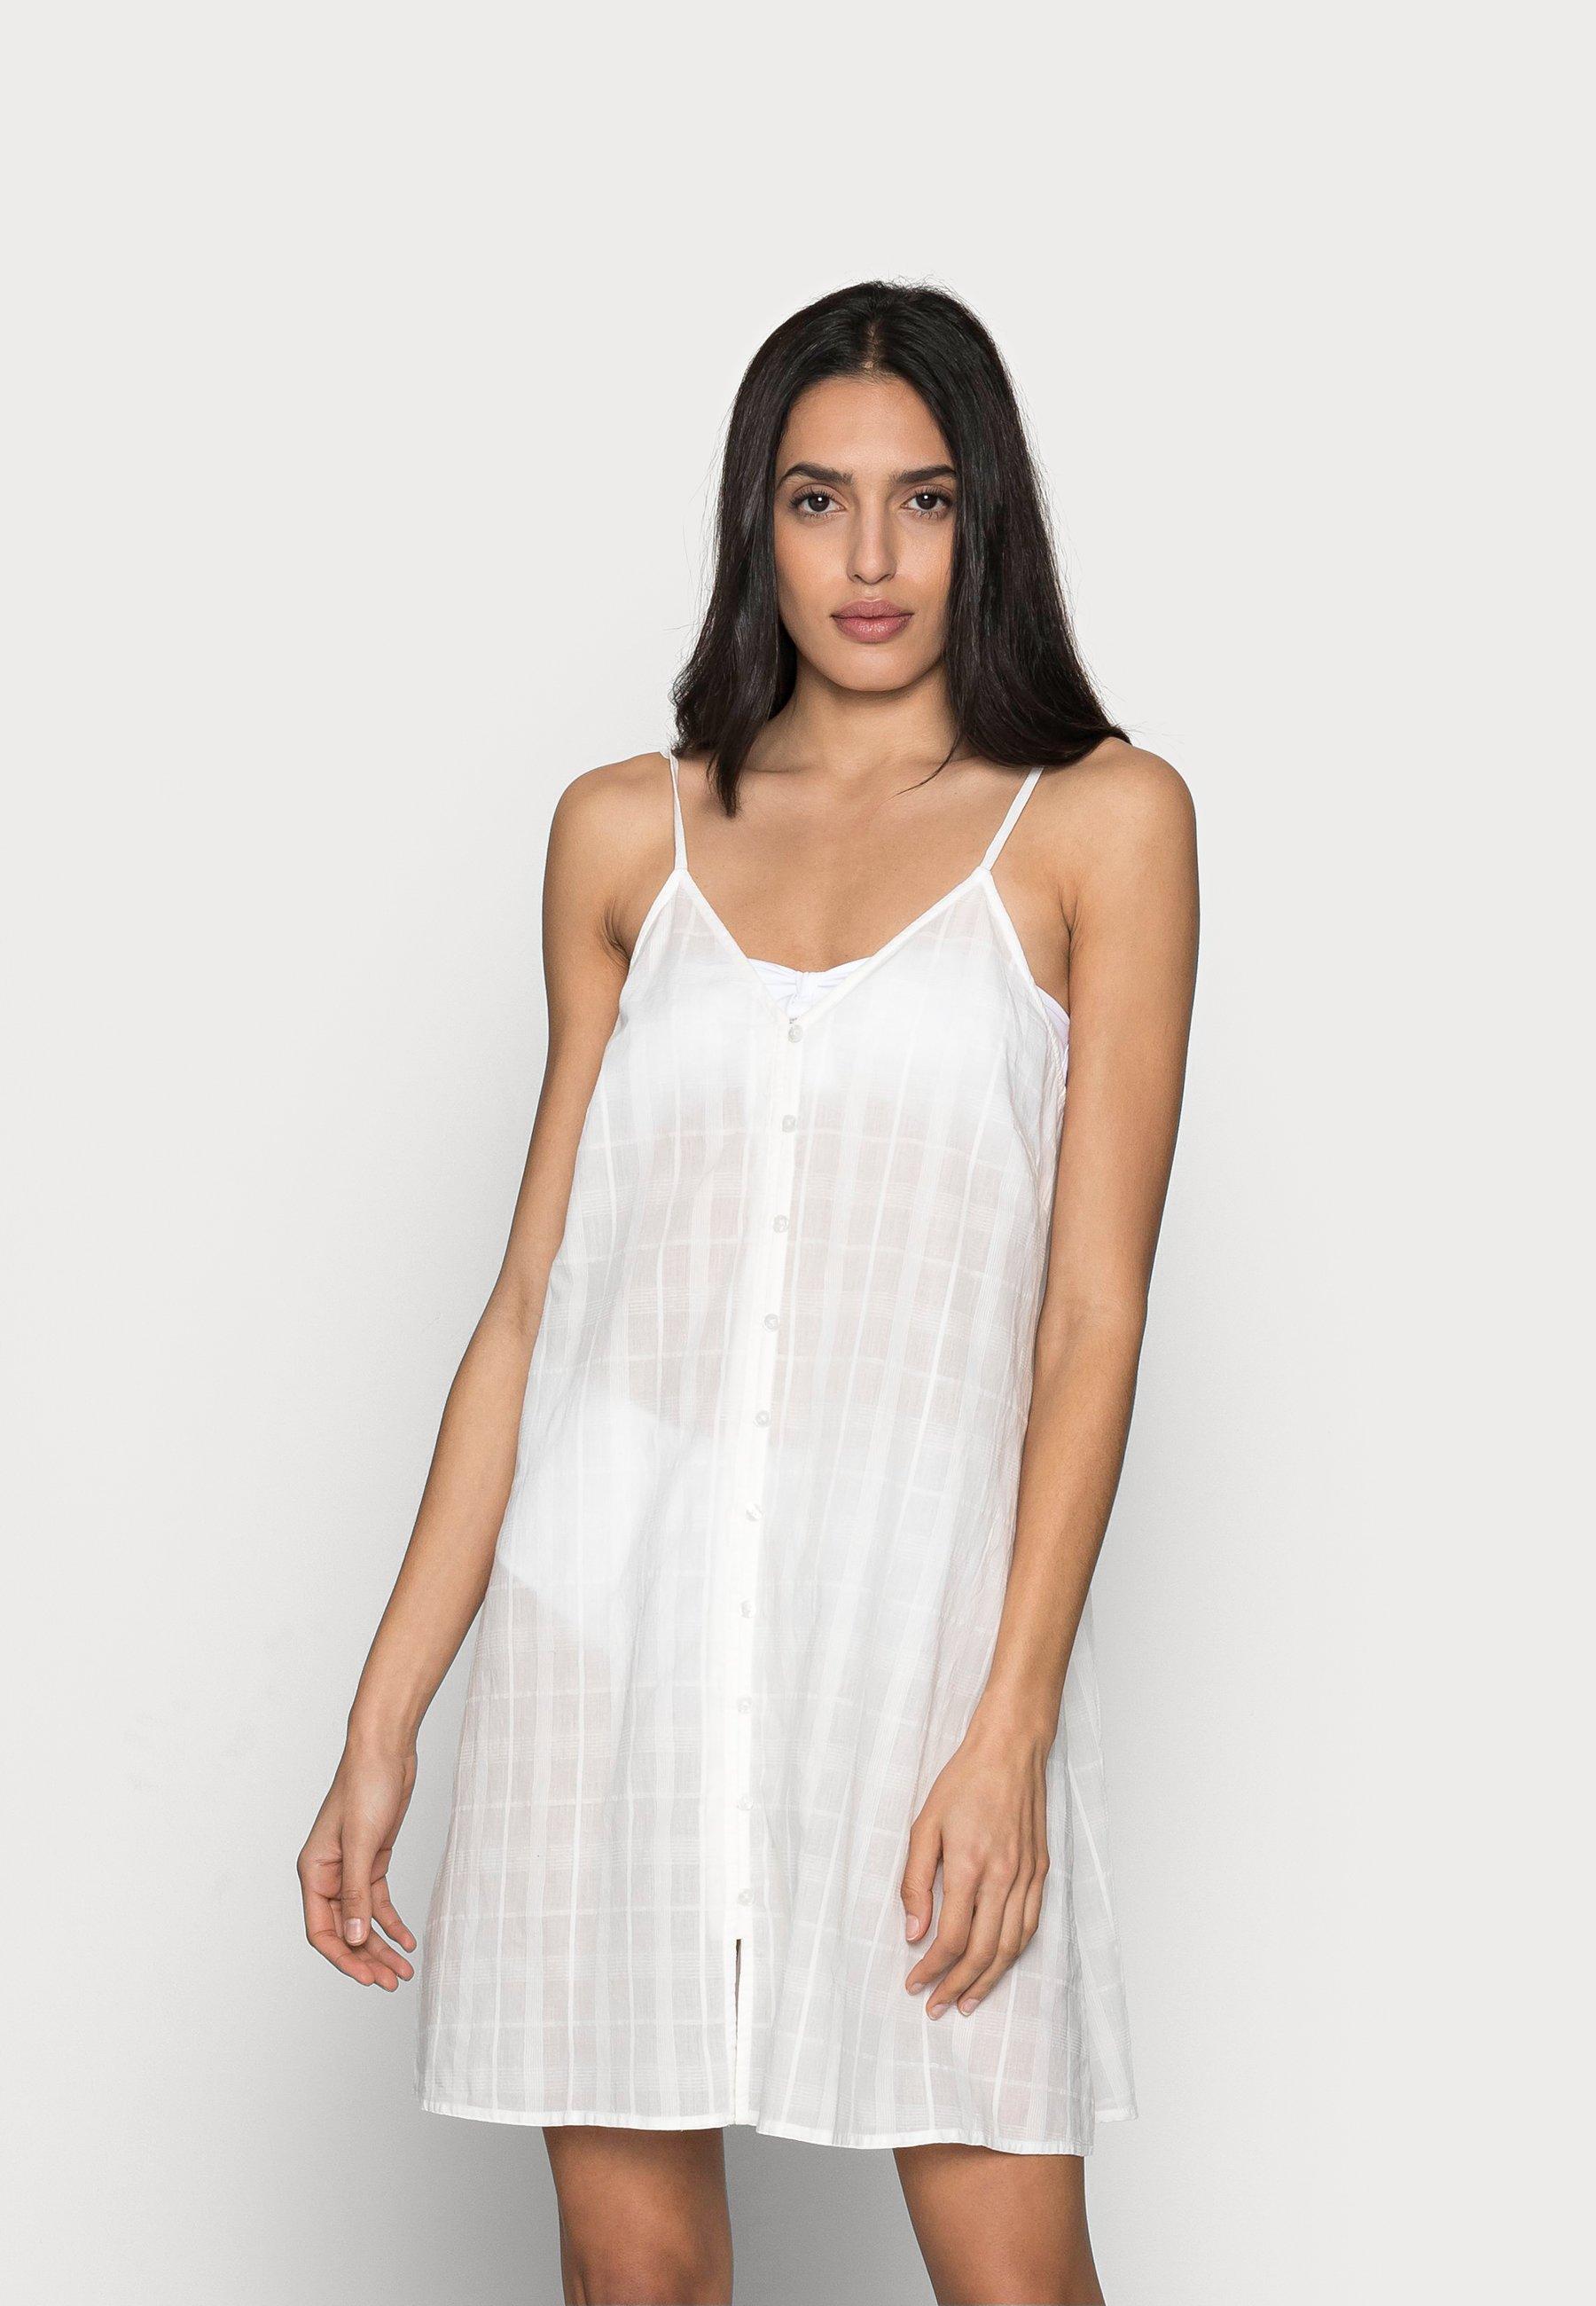 Femme ONLLIBBY  BEACH DRESS - Accessoire de plage